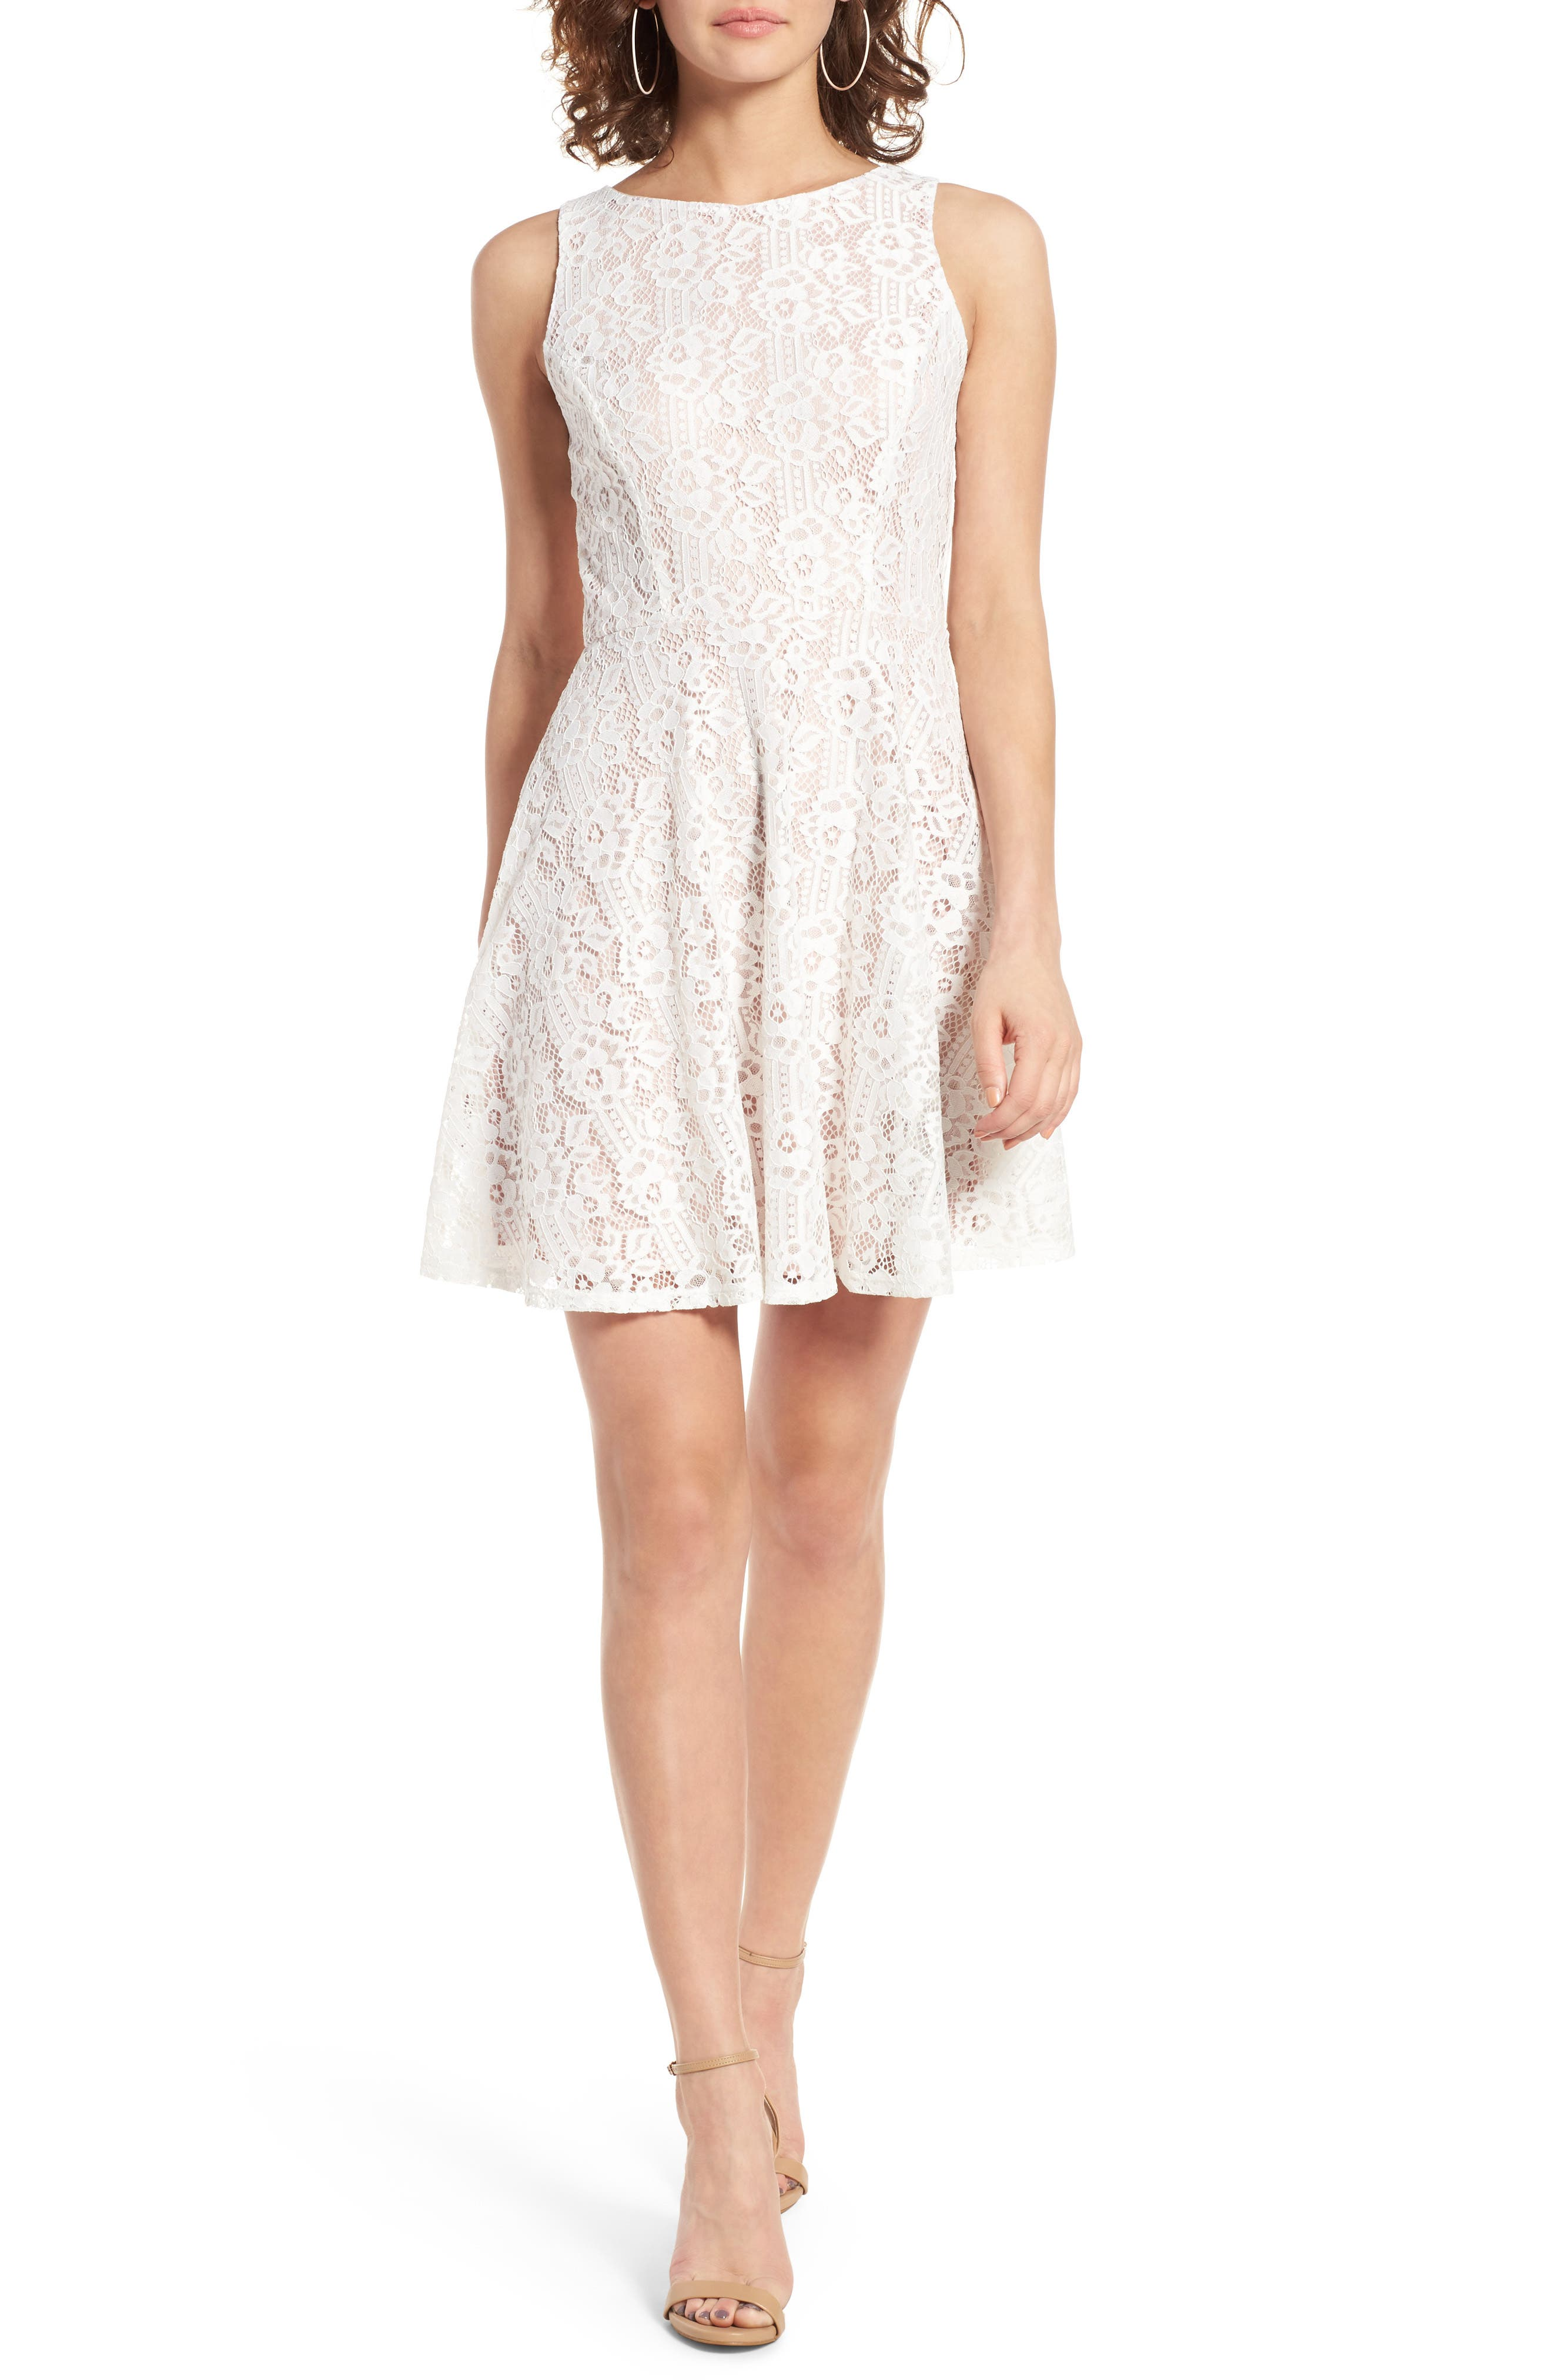 Main Image - Speechless Lace Skater Dress